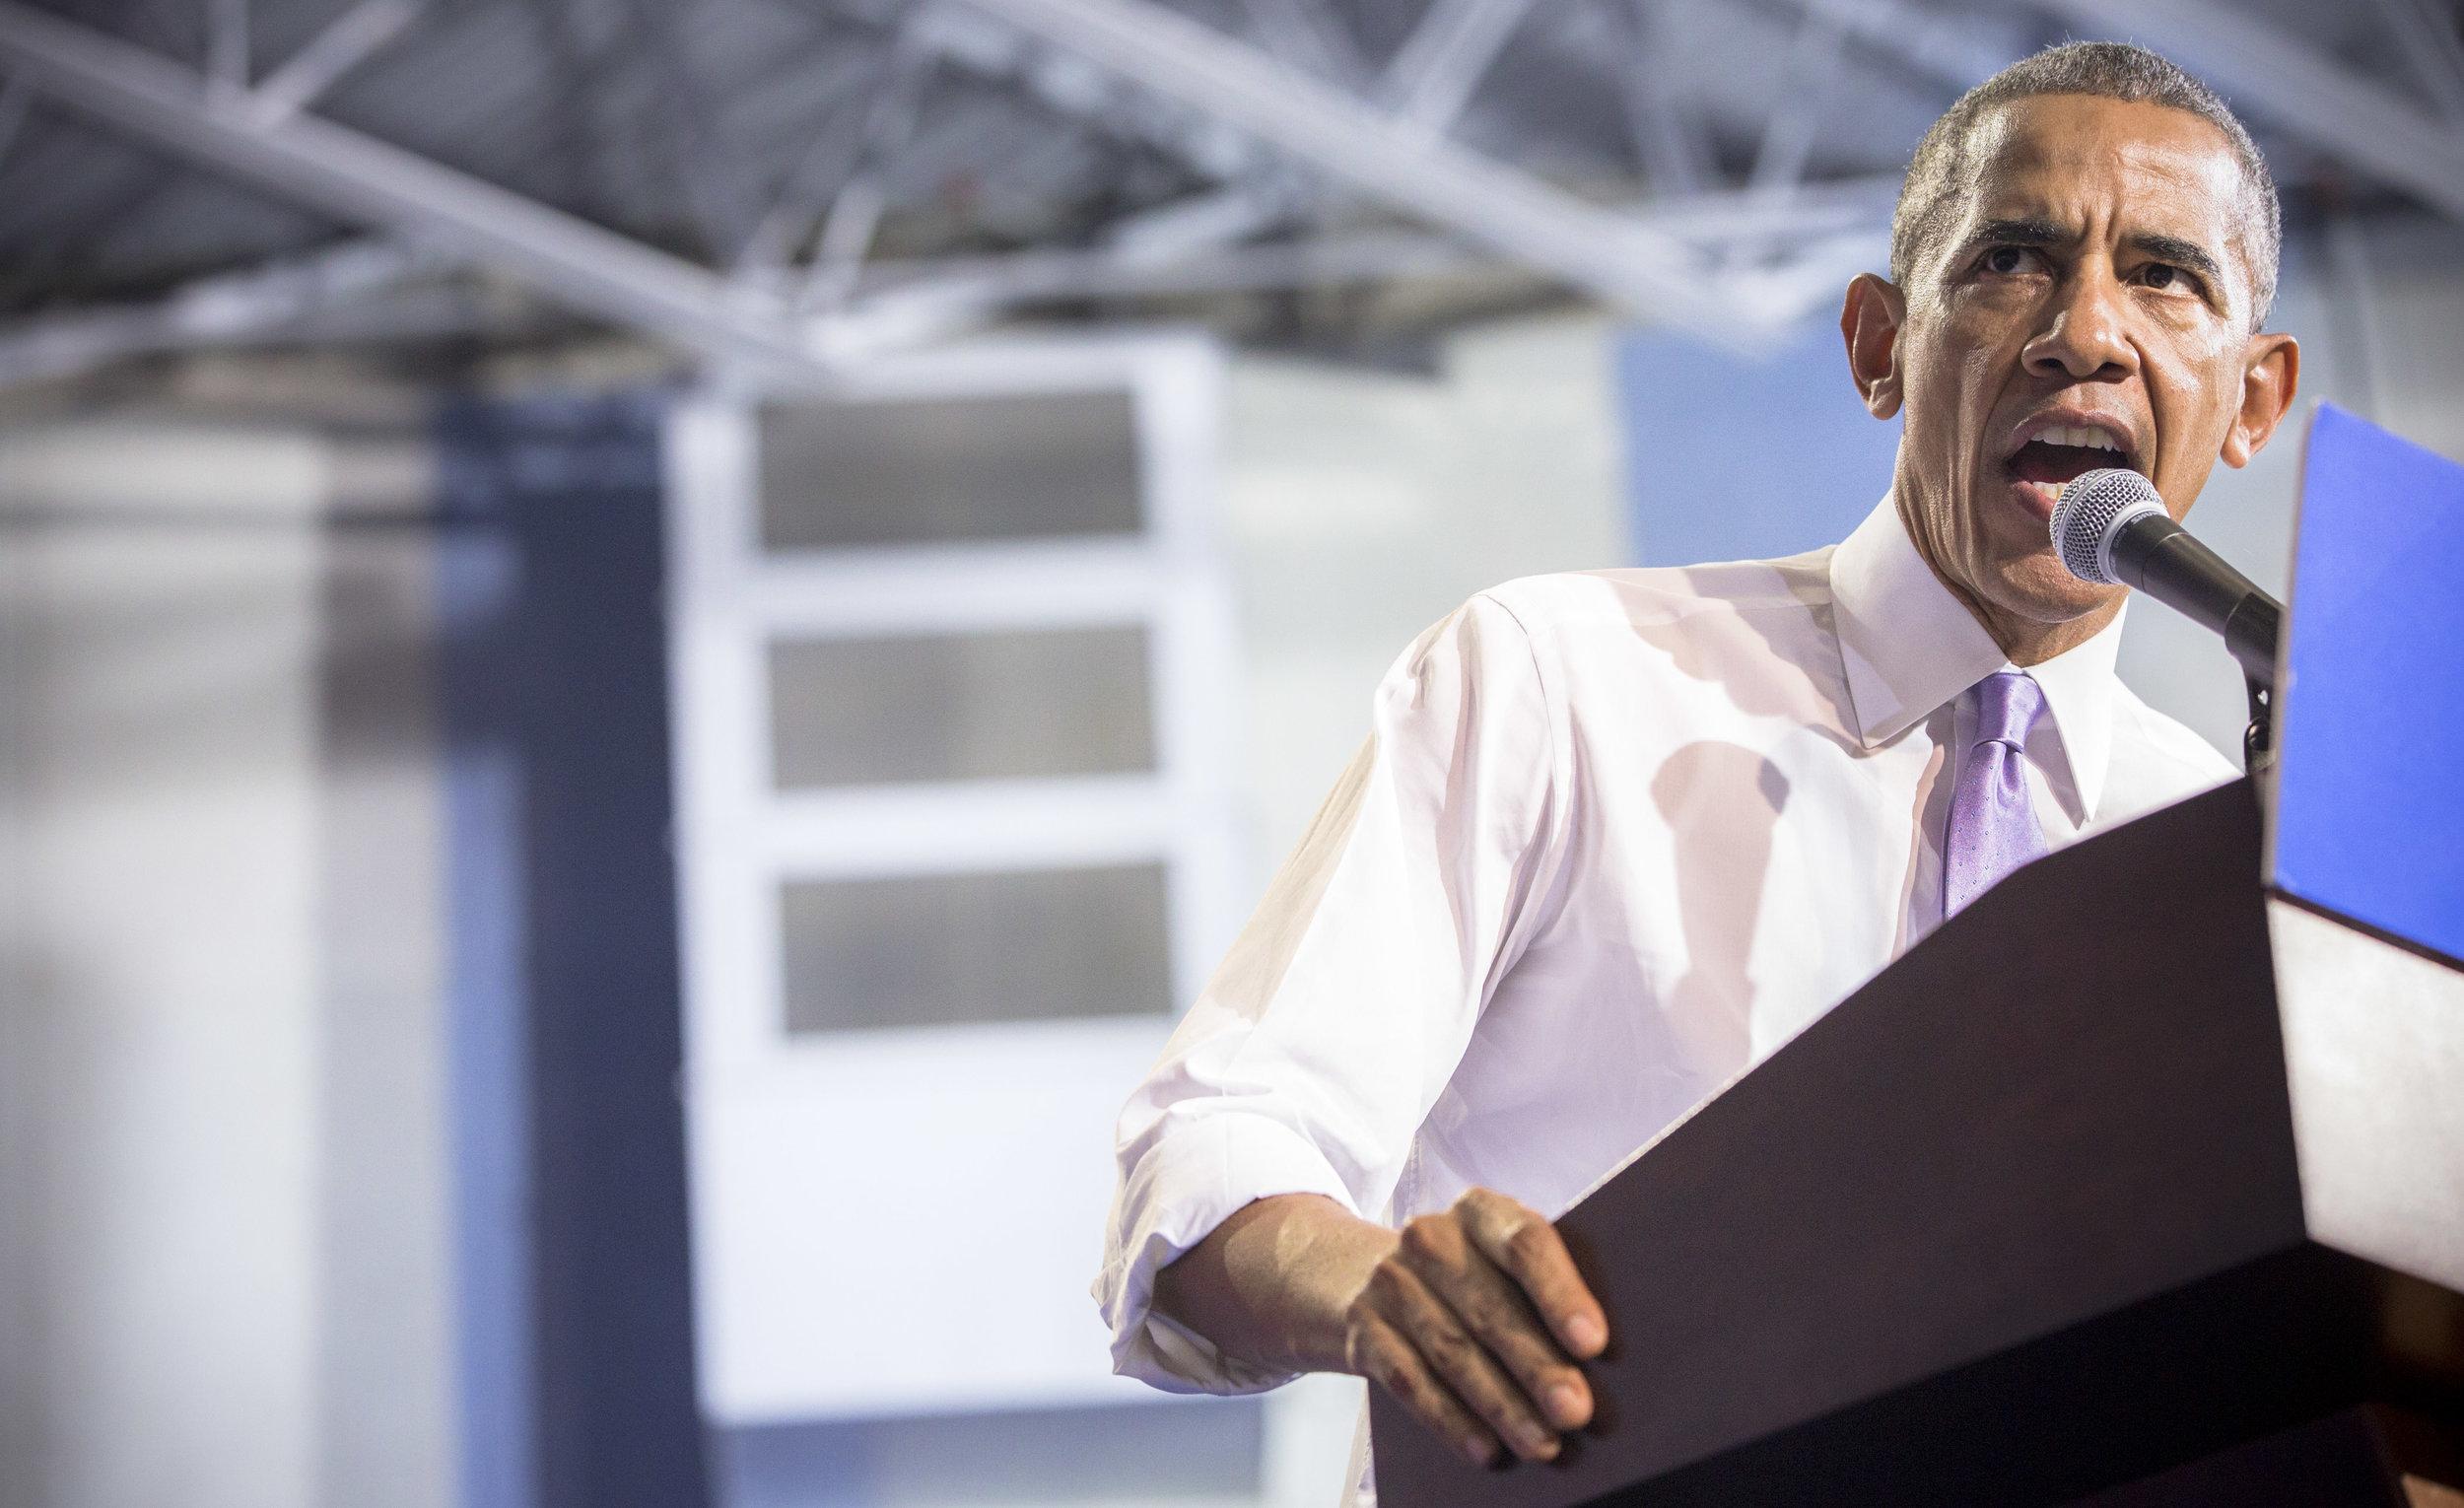 10202016_BJM_Barack_Obama_Campaigns_in_Miami_Florida_11.jpg